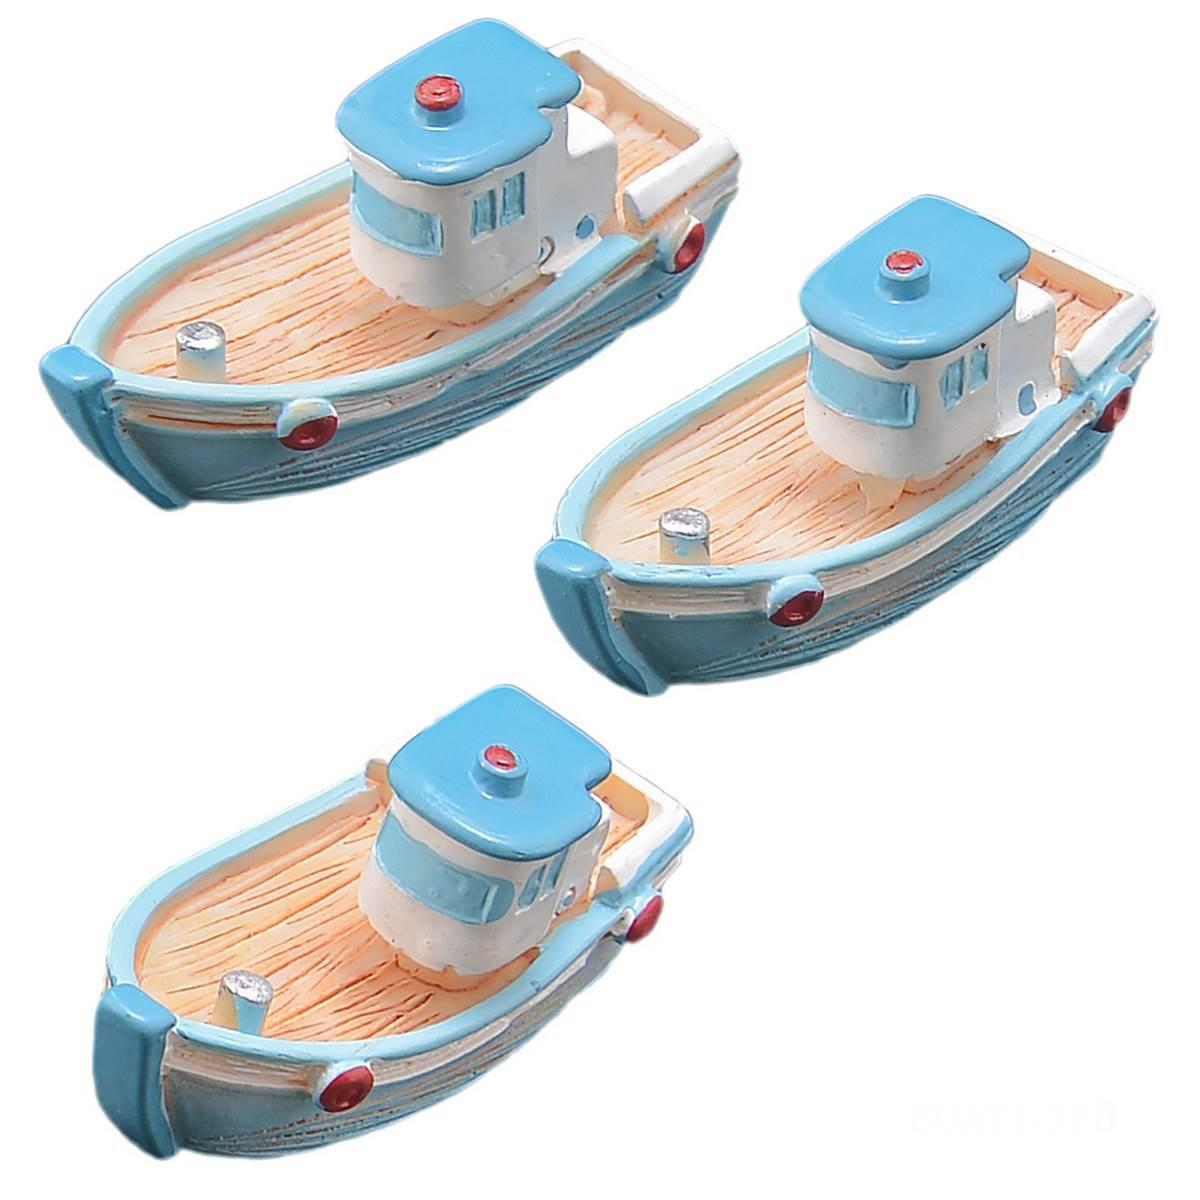 Miniature Boat